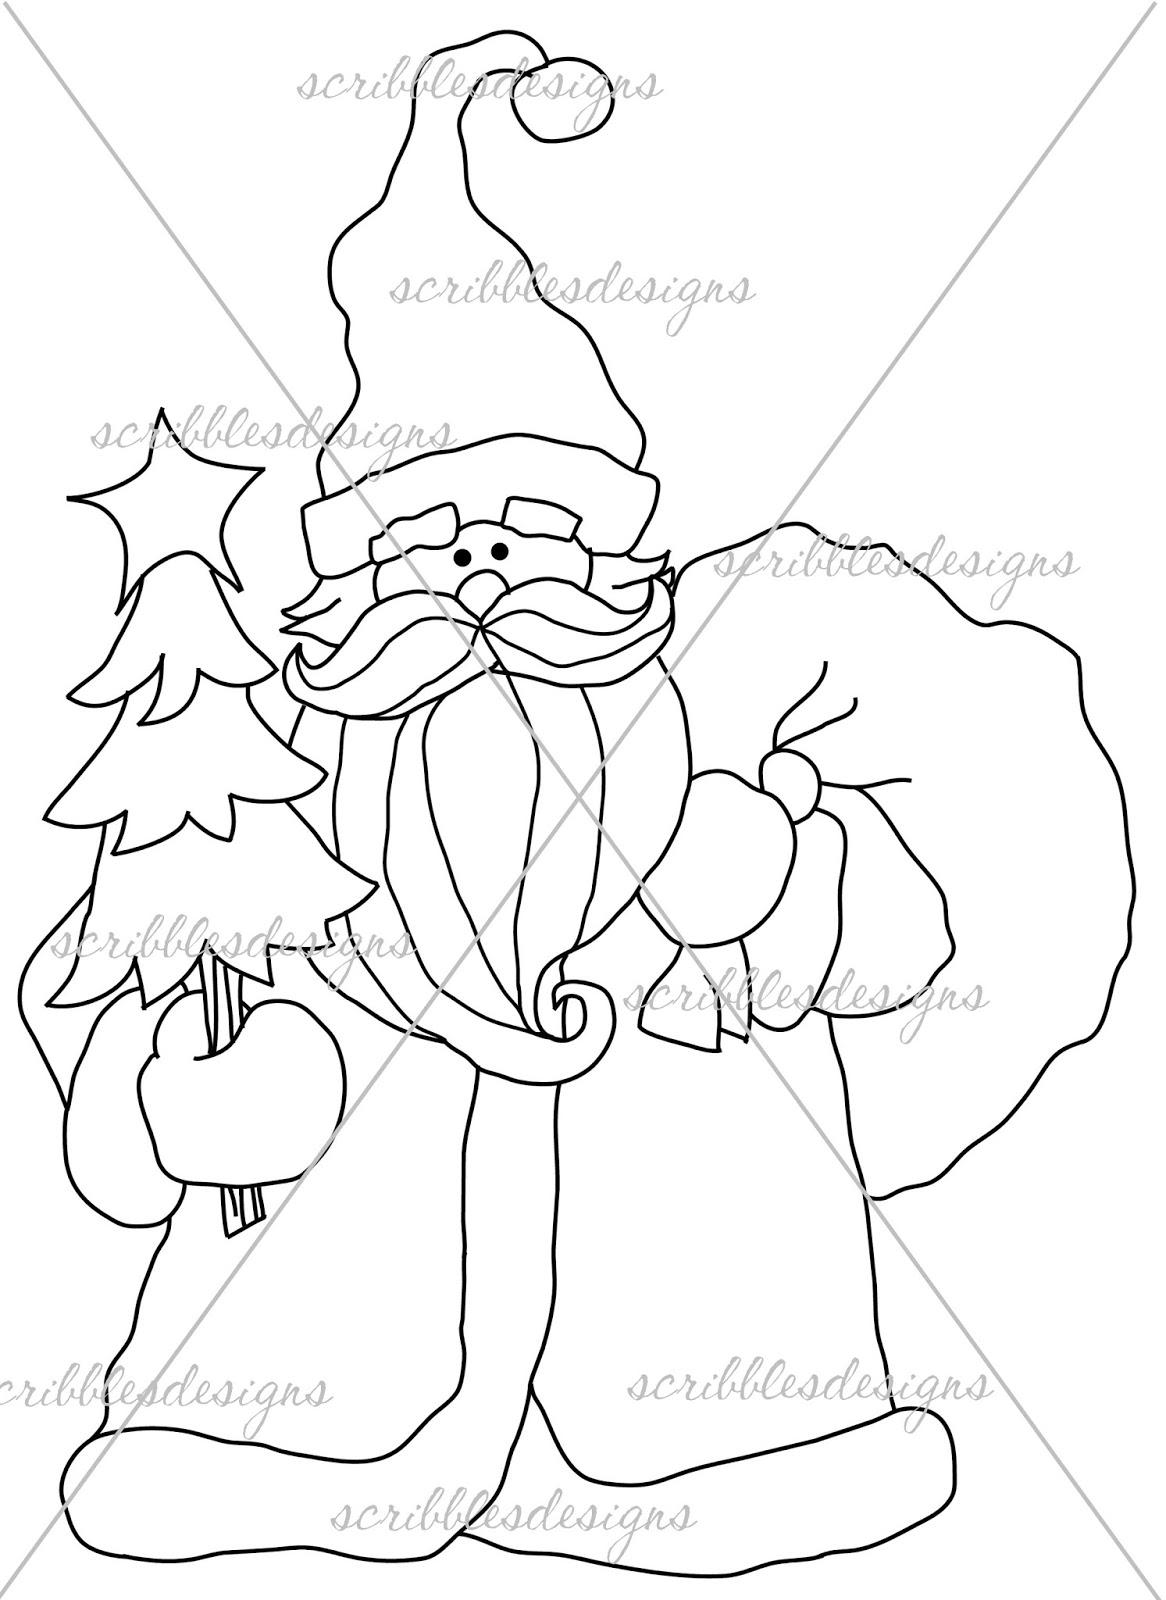 http://buyscribblesdesigns.blogspot.ca/2014/12/872-woodland-santa-300.html